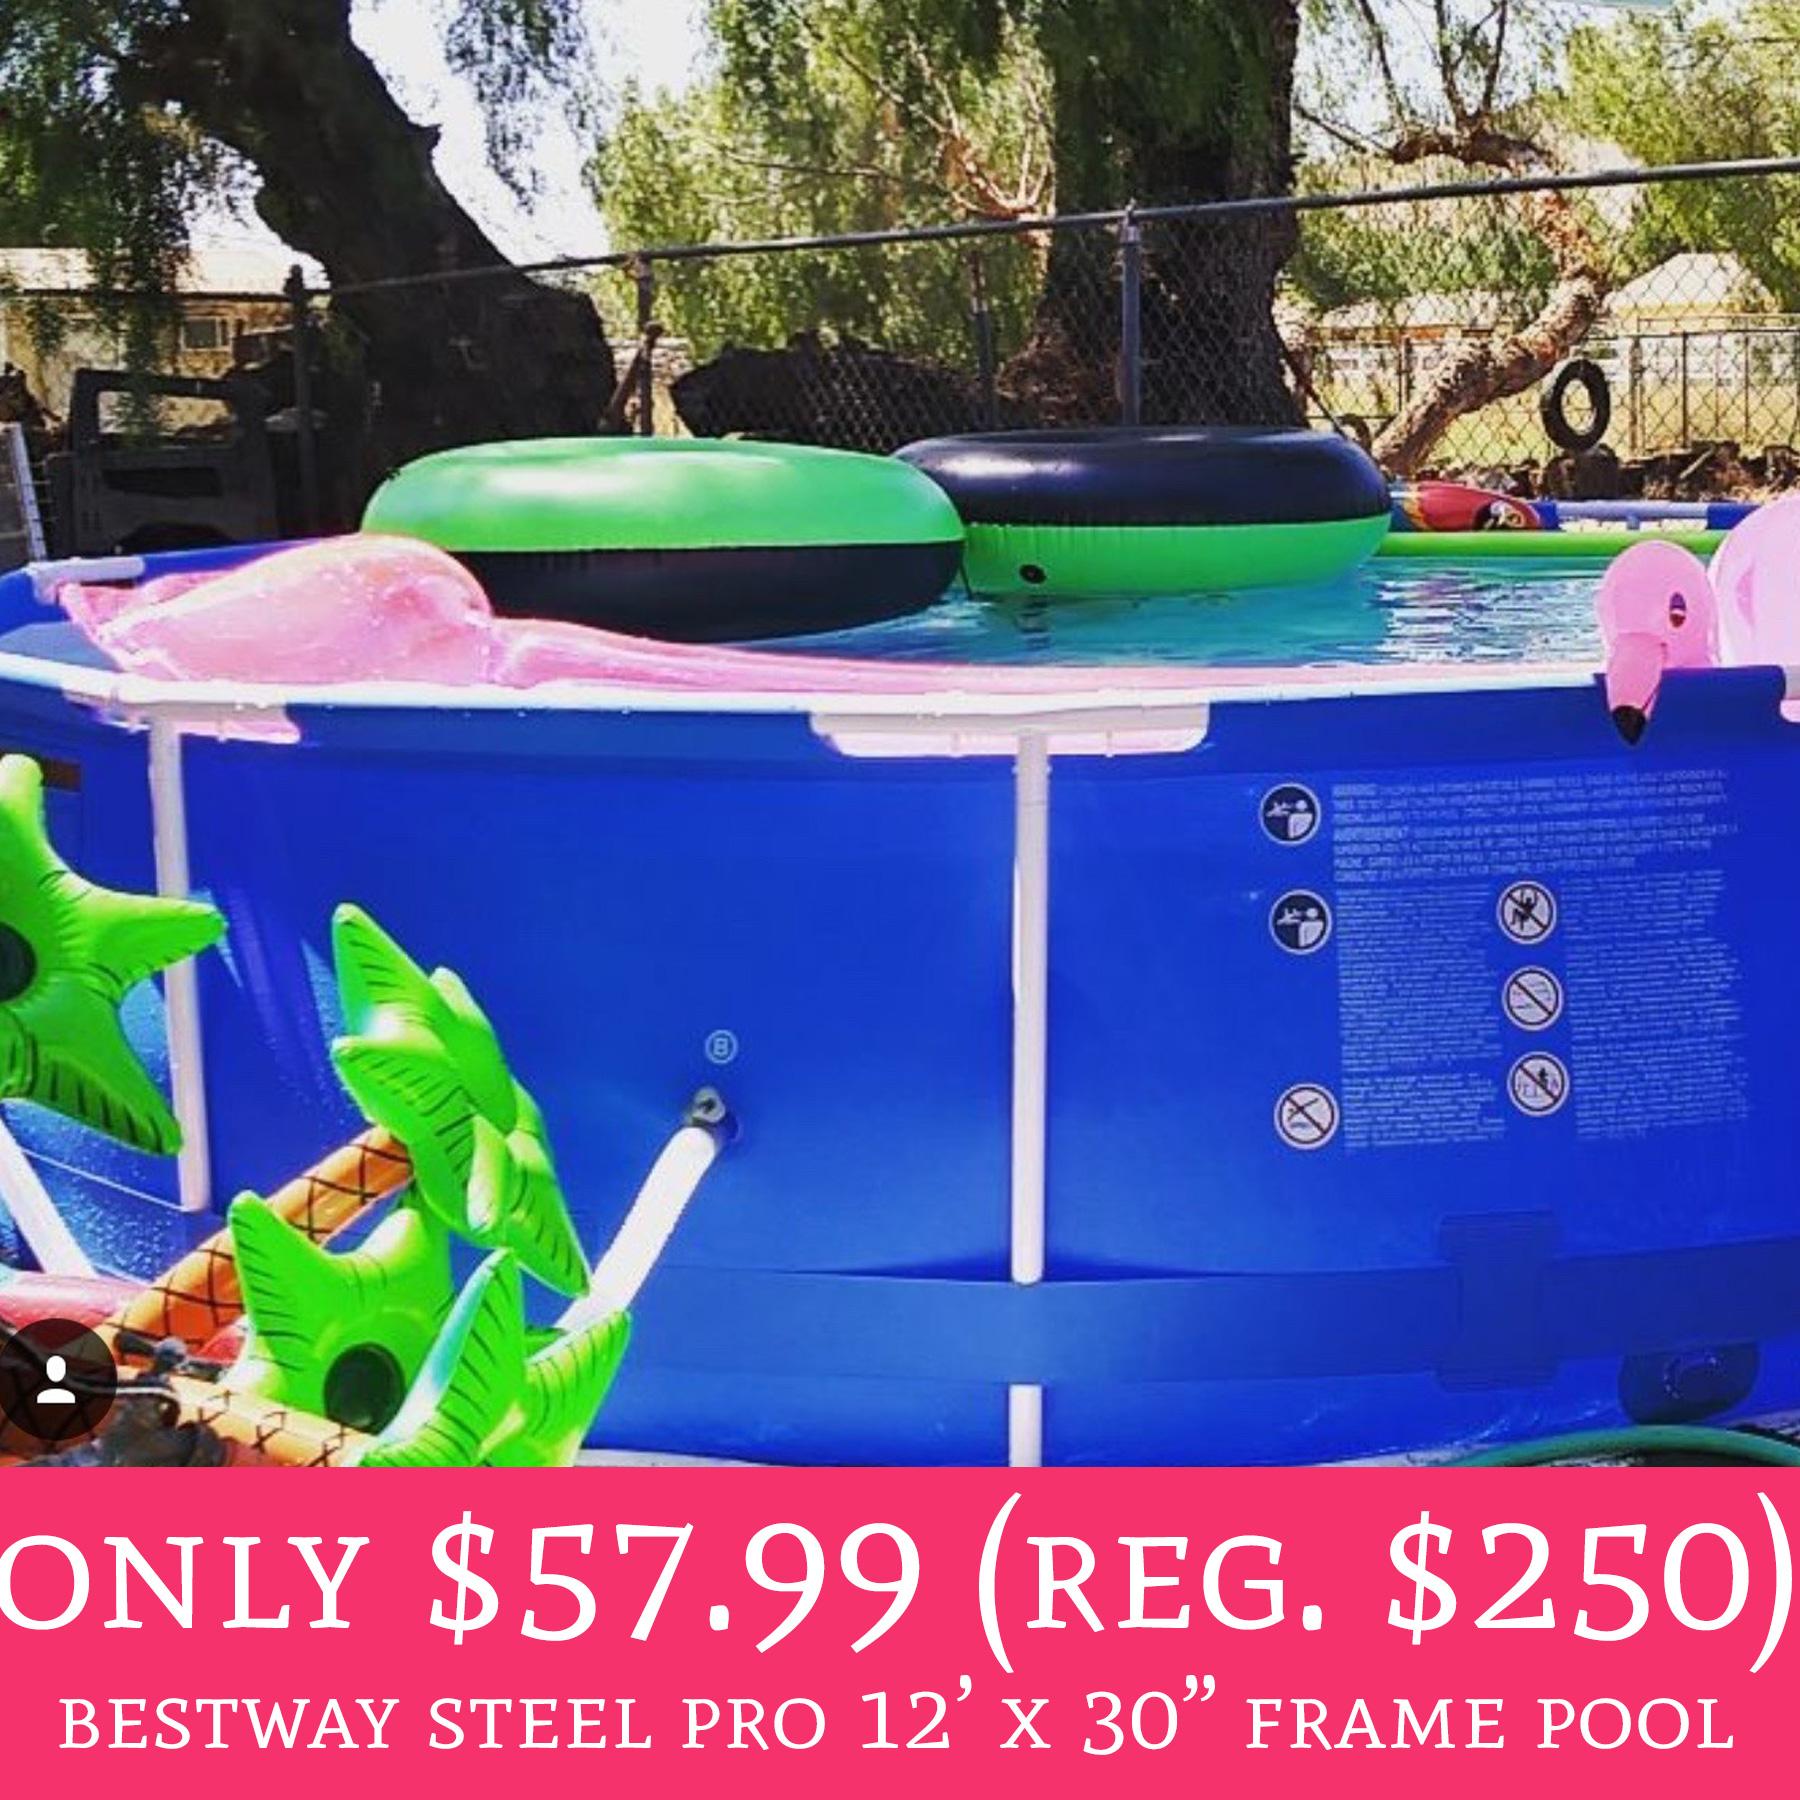 Whoa only regular 250 bestway steel pro 12 x for Bestway pools for sale